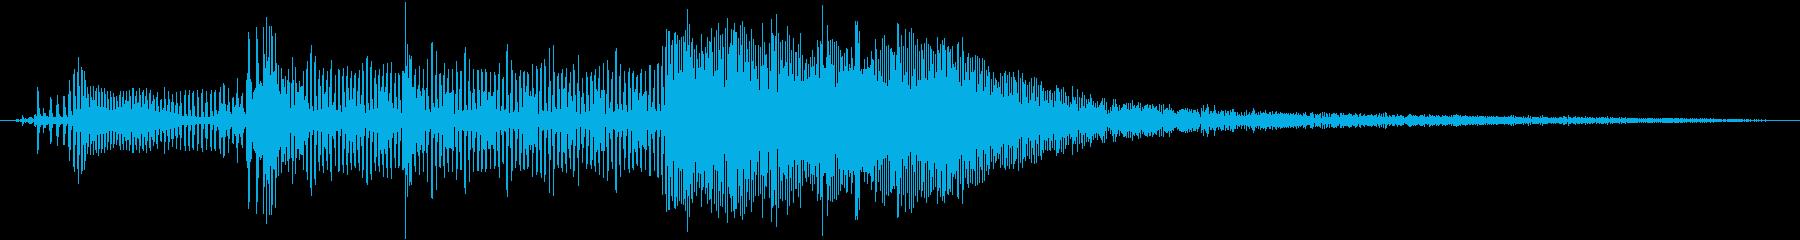 250 Cc Atv 4X4:2つ...の再生済みの波形